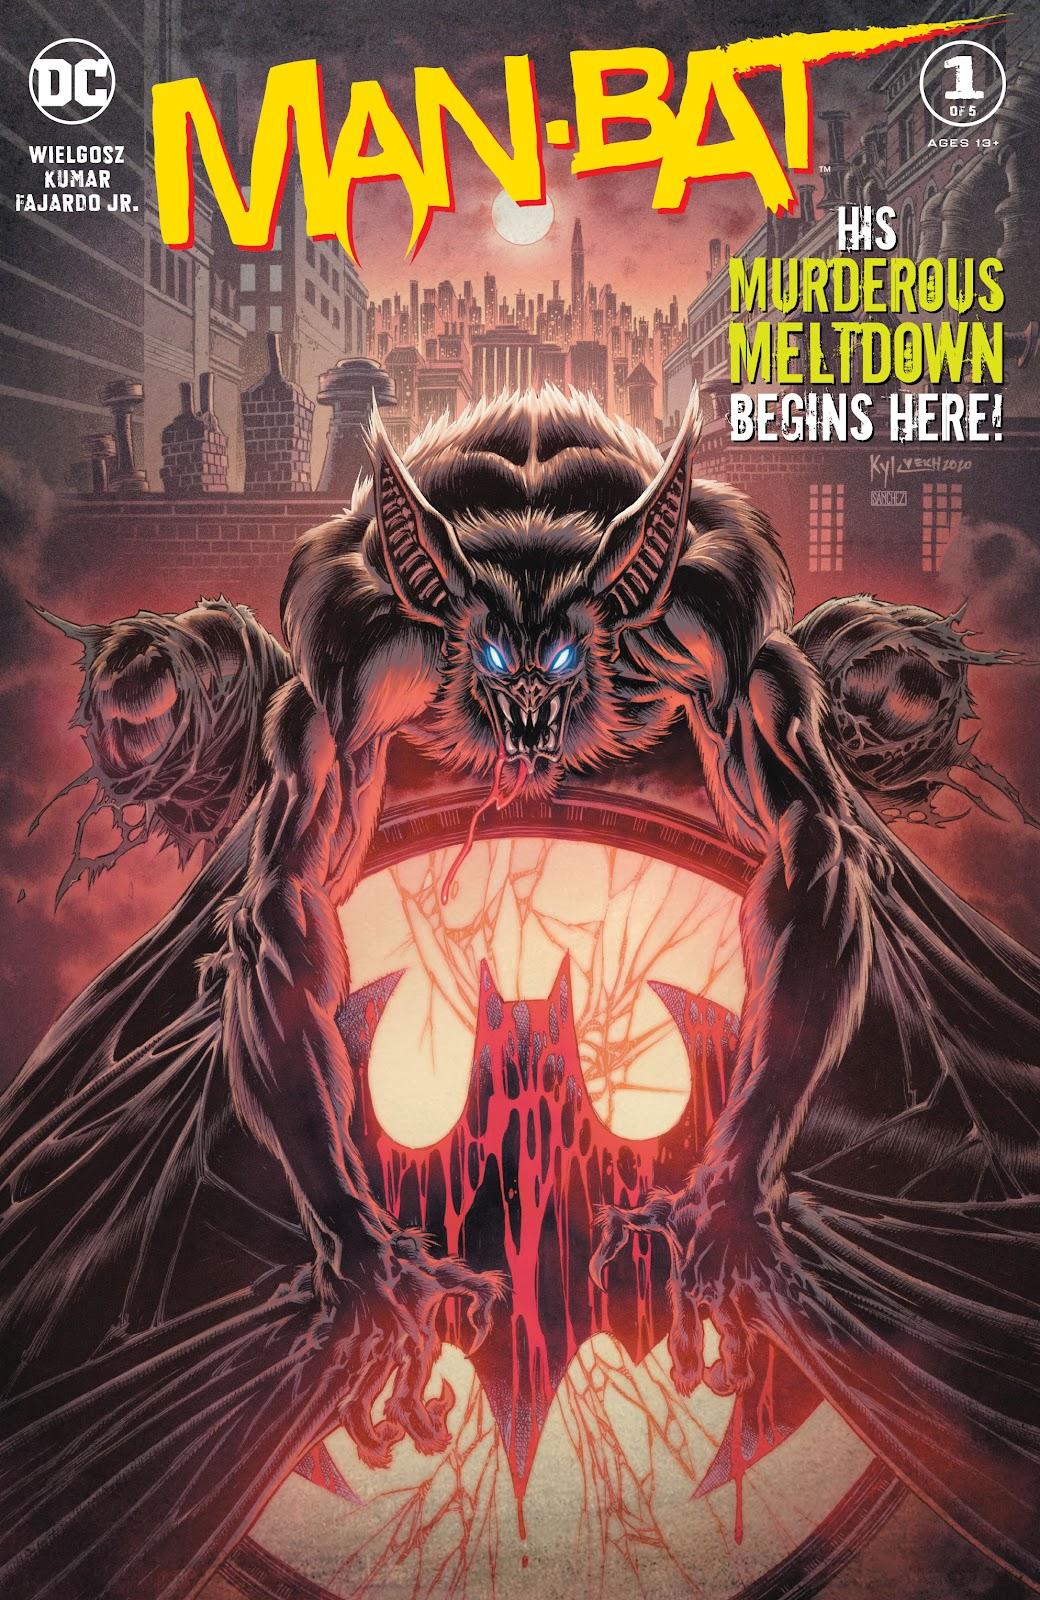 Man-Bat (2021) issue 1 - Page 1